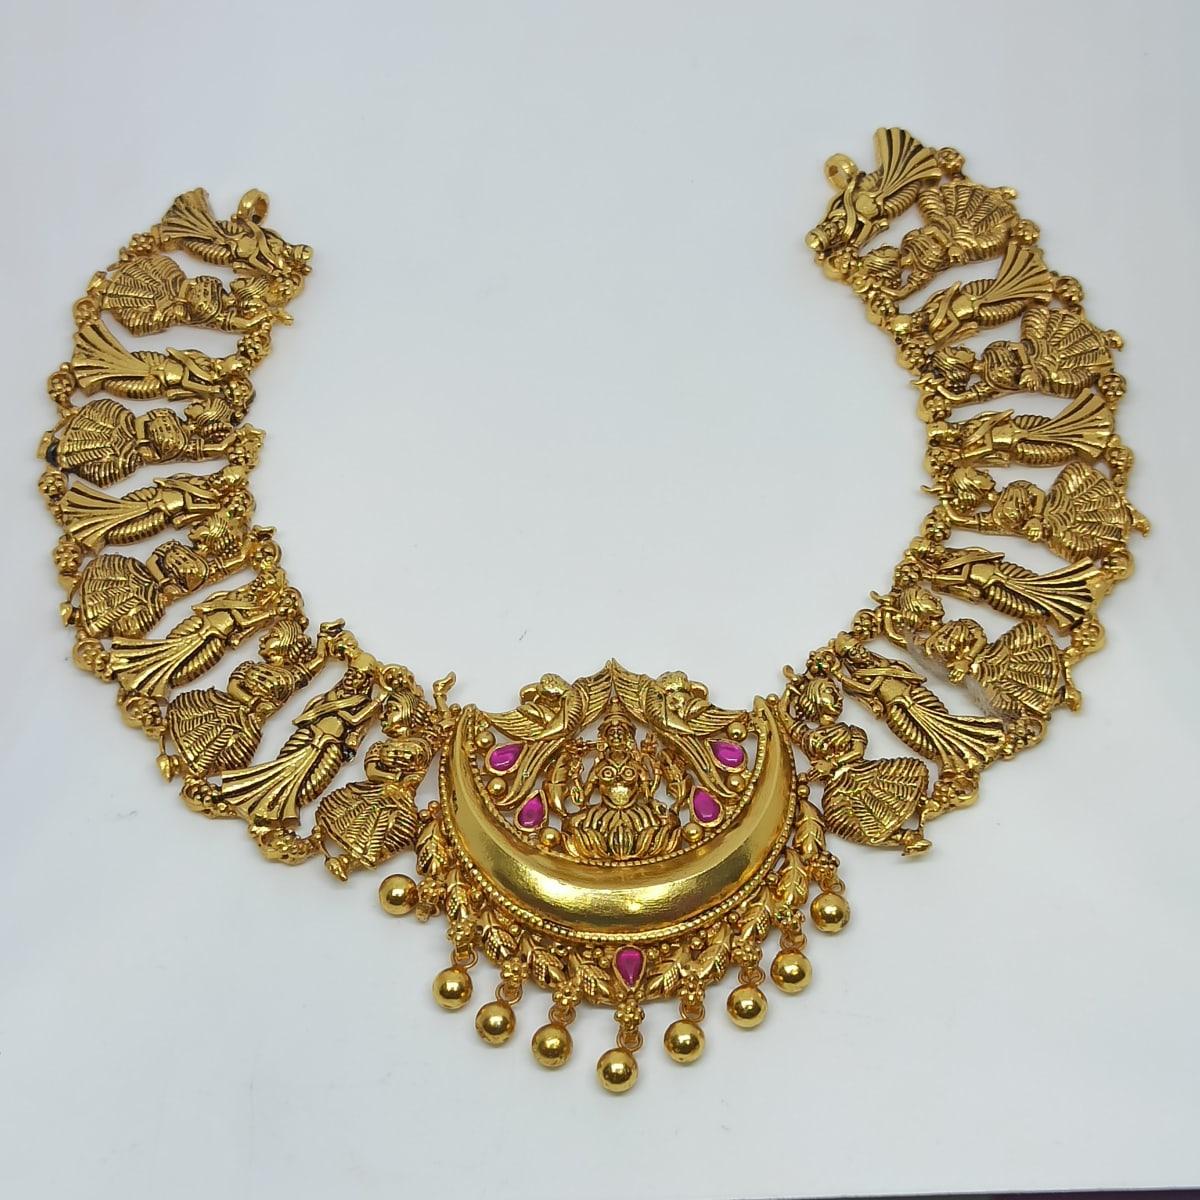 Natraj Antique Neckalace